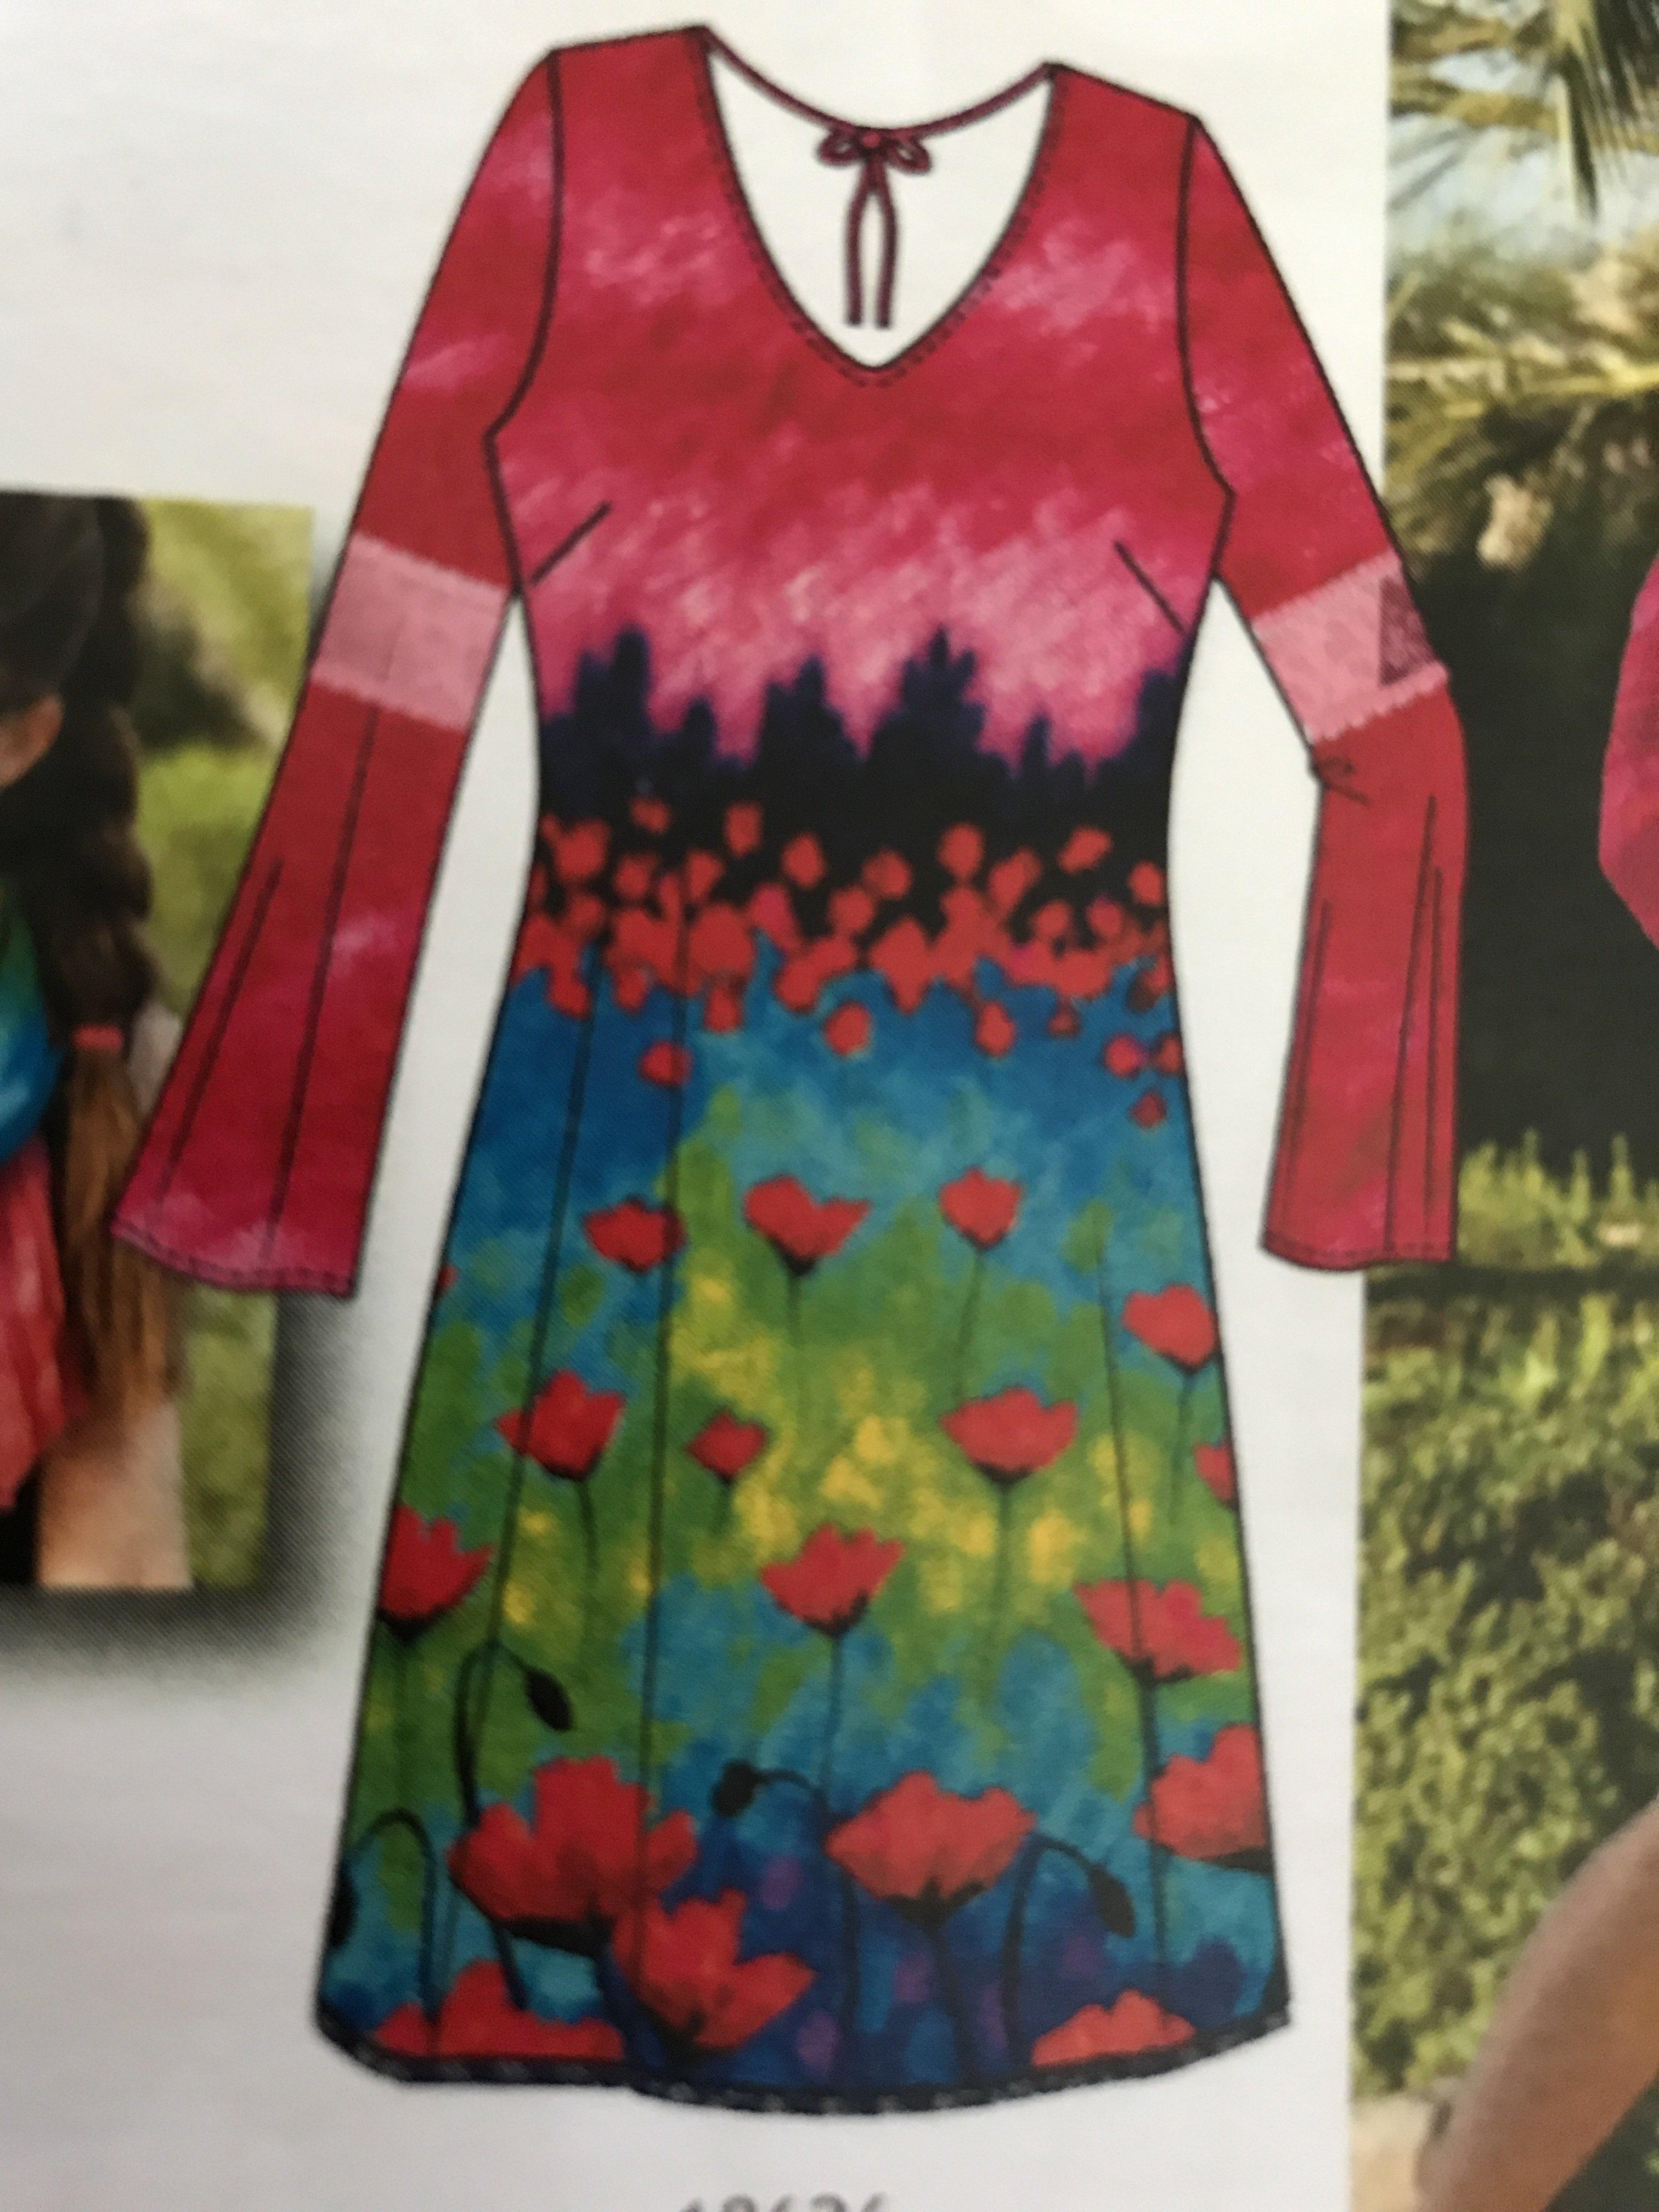 Simply Art Dolcezza: Fuschia Pink Indigo Painting Art Dress (1 Left!)